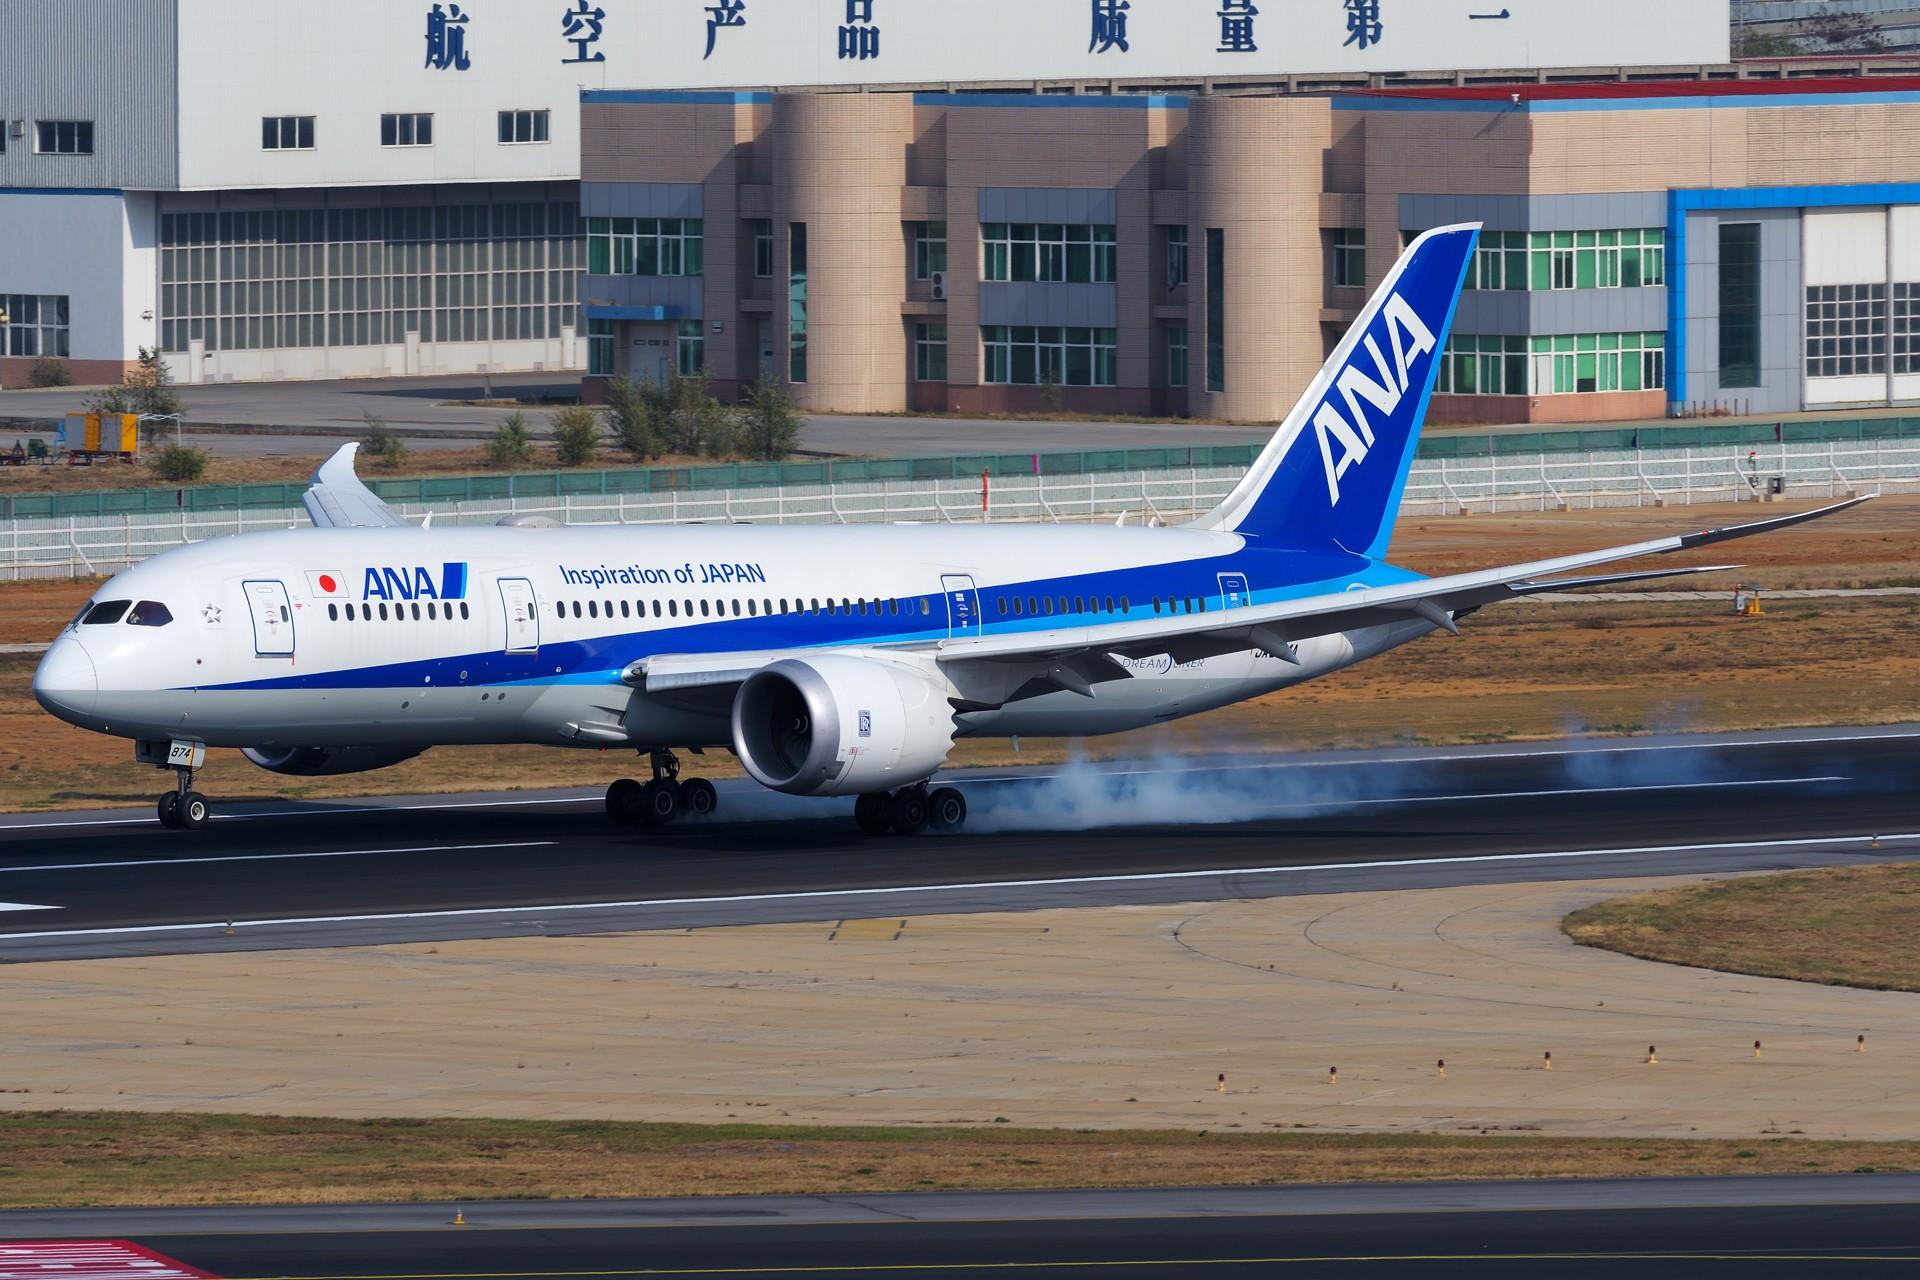 Re:[原创]★[DLC]2016年终总结(持续更新中)★ BOEING 787-8 JA874A 中国大连国际机场